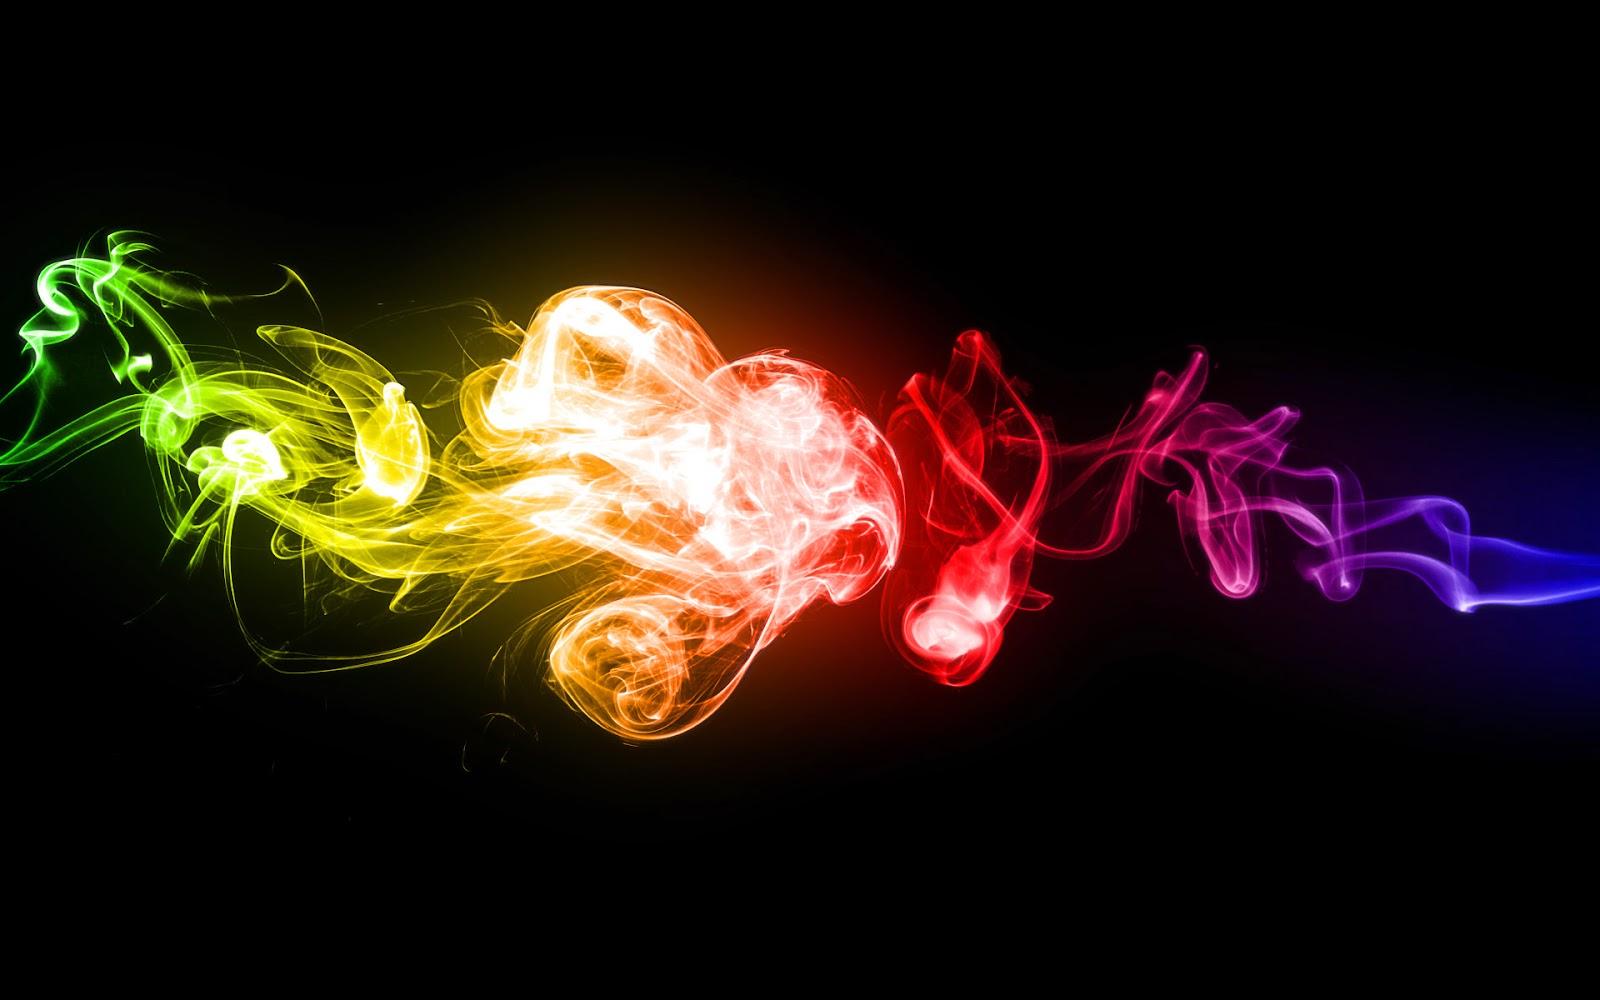 mac os x wallpapers: smoke wallpaper hd